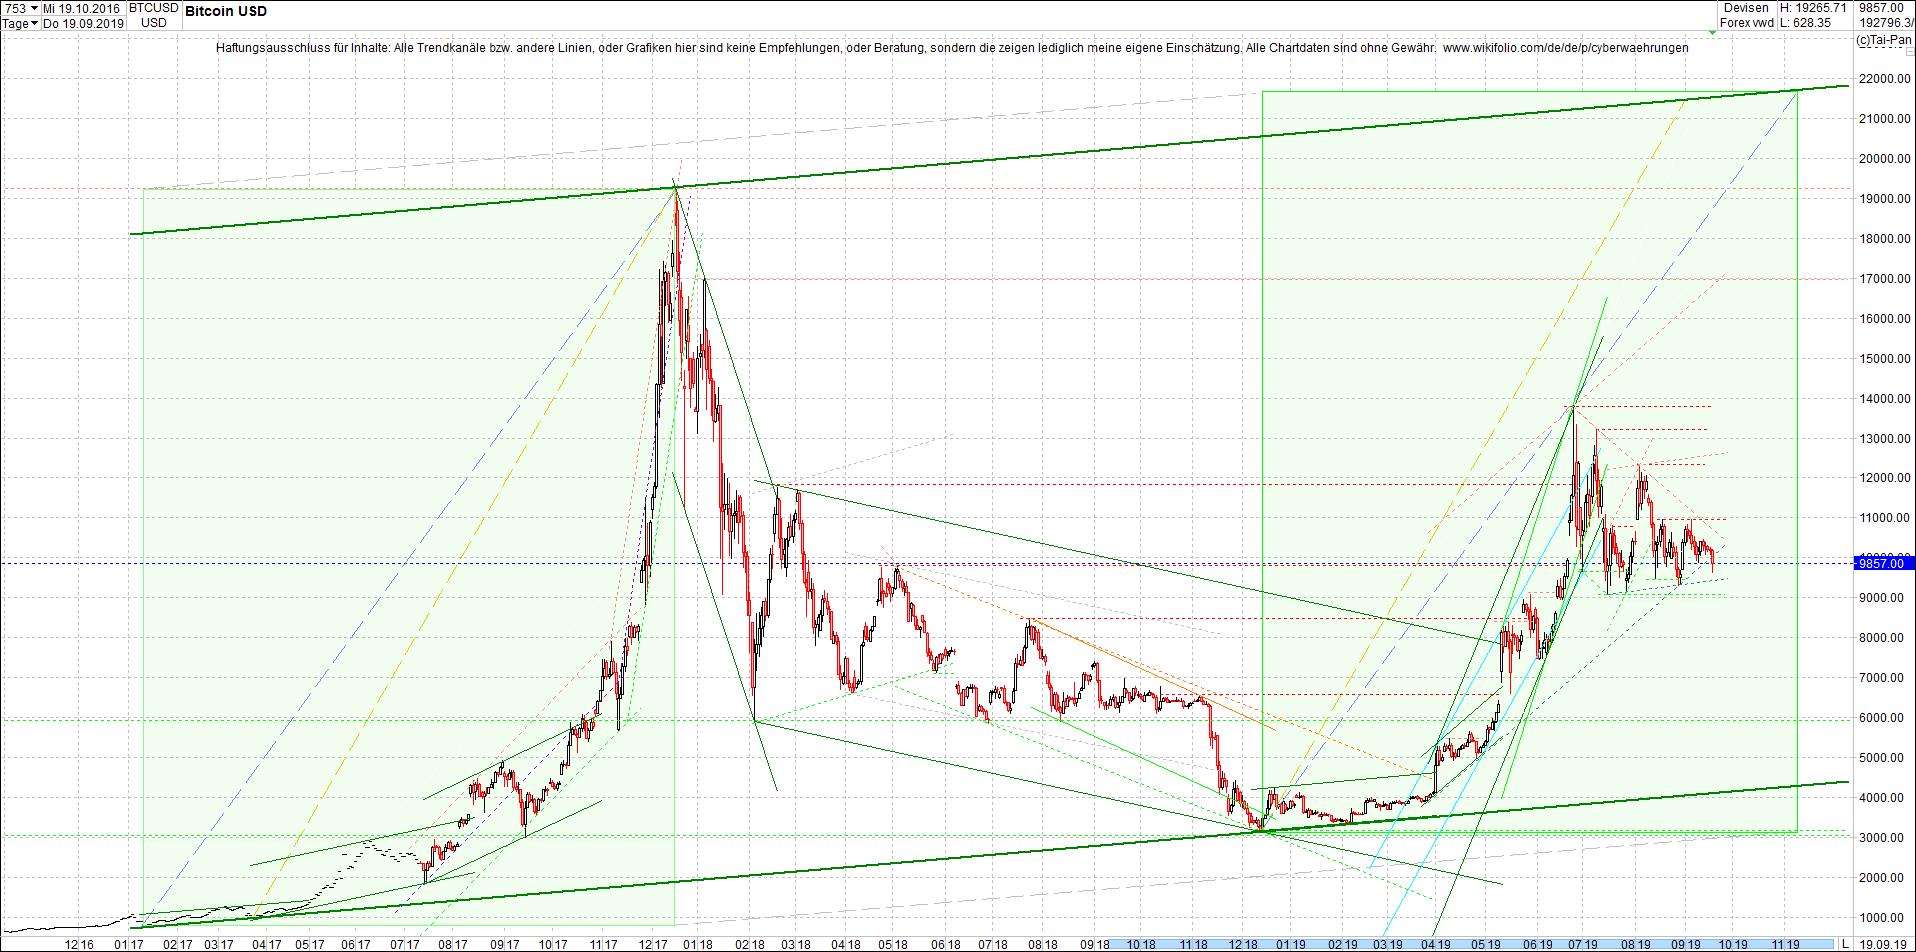 bitcoin_(btc)_chart_heute_nachmittag.png